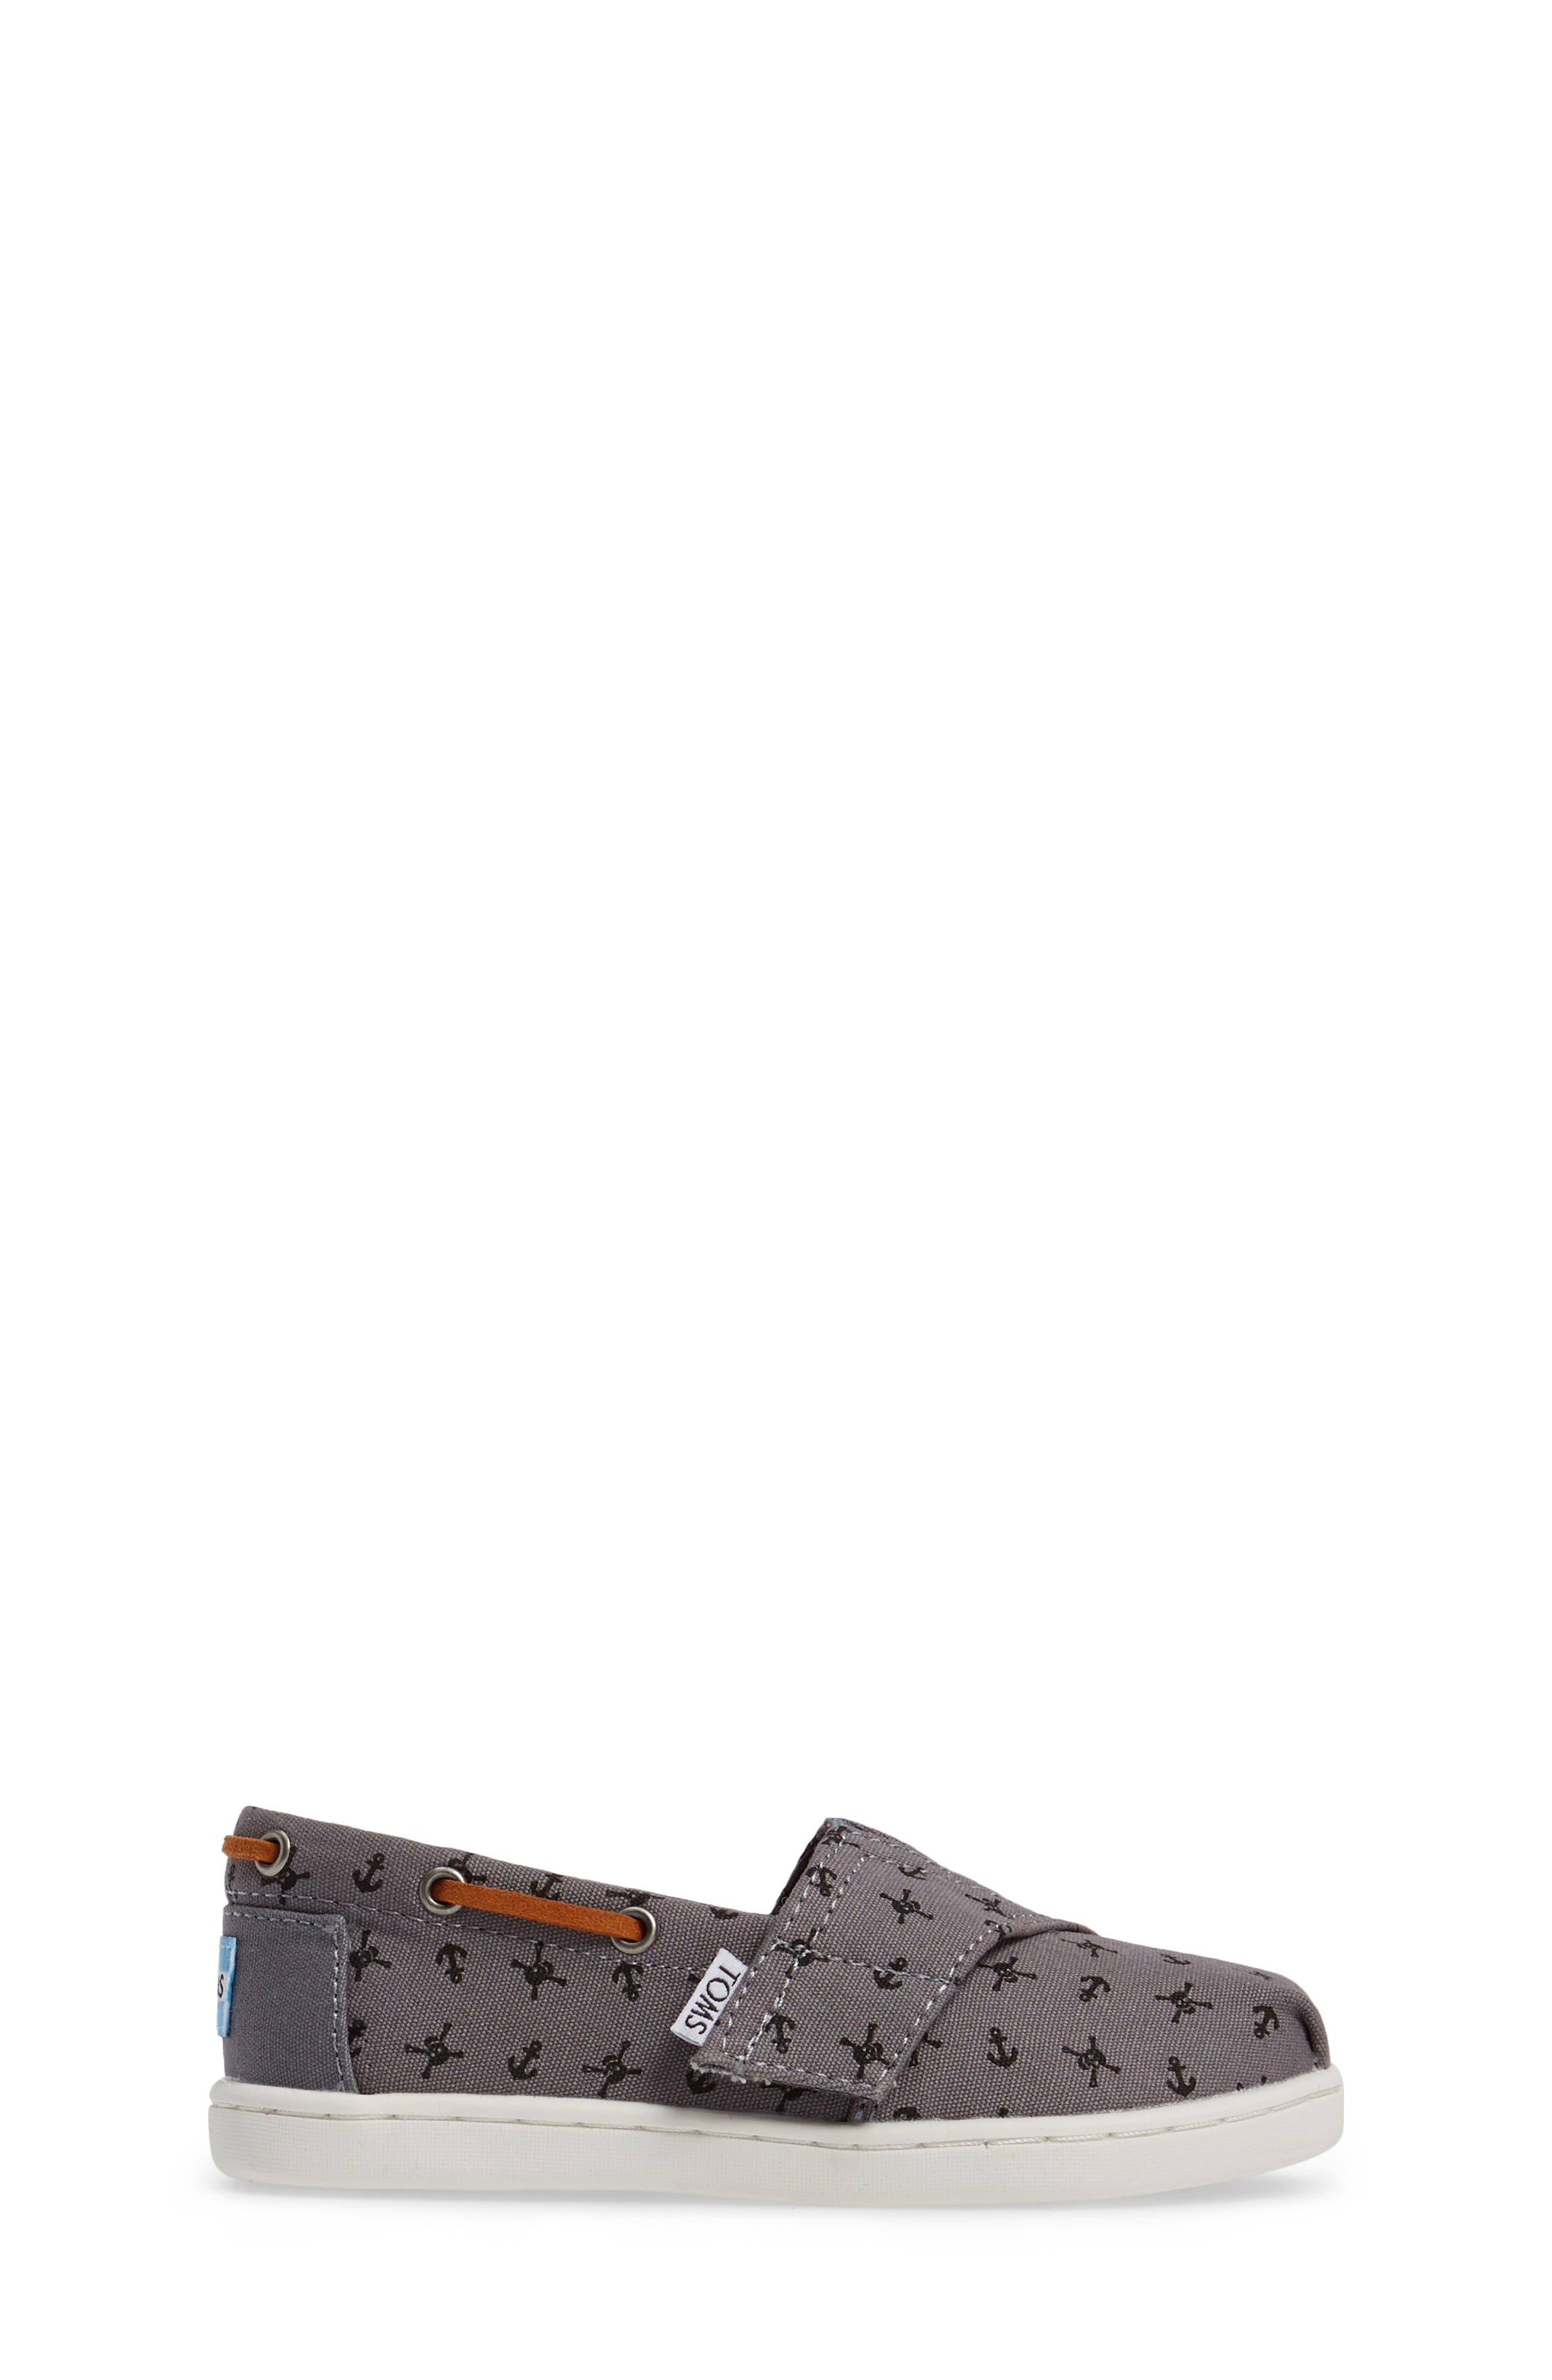 Bimini Print Slip-On,                             Alternate thumbnail 3, color,                             Steel Grey Skulls Canvas